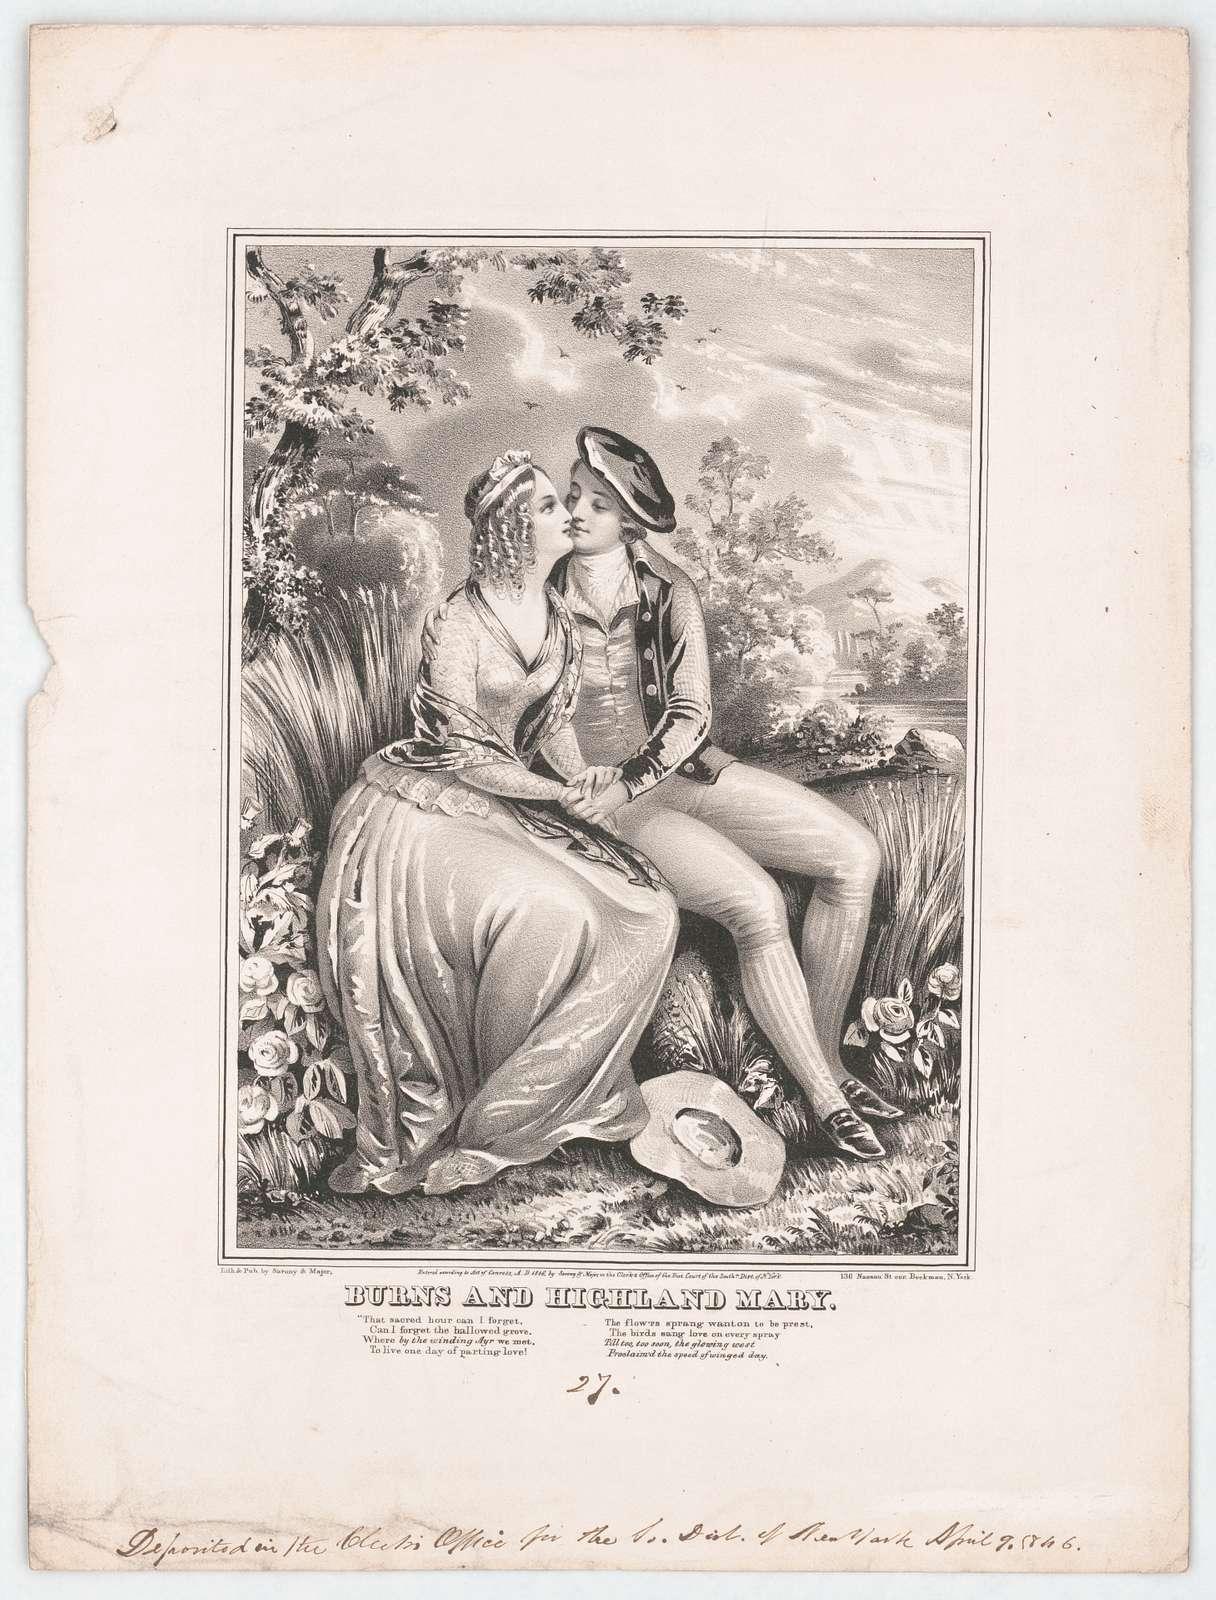 Burns and highland Mary / lith. & pub by Sarony & Major 136 Nassau St. cor. Bookman, N. York.